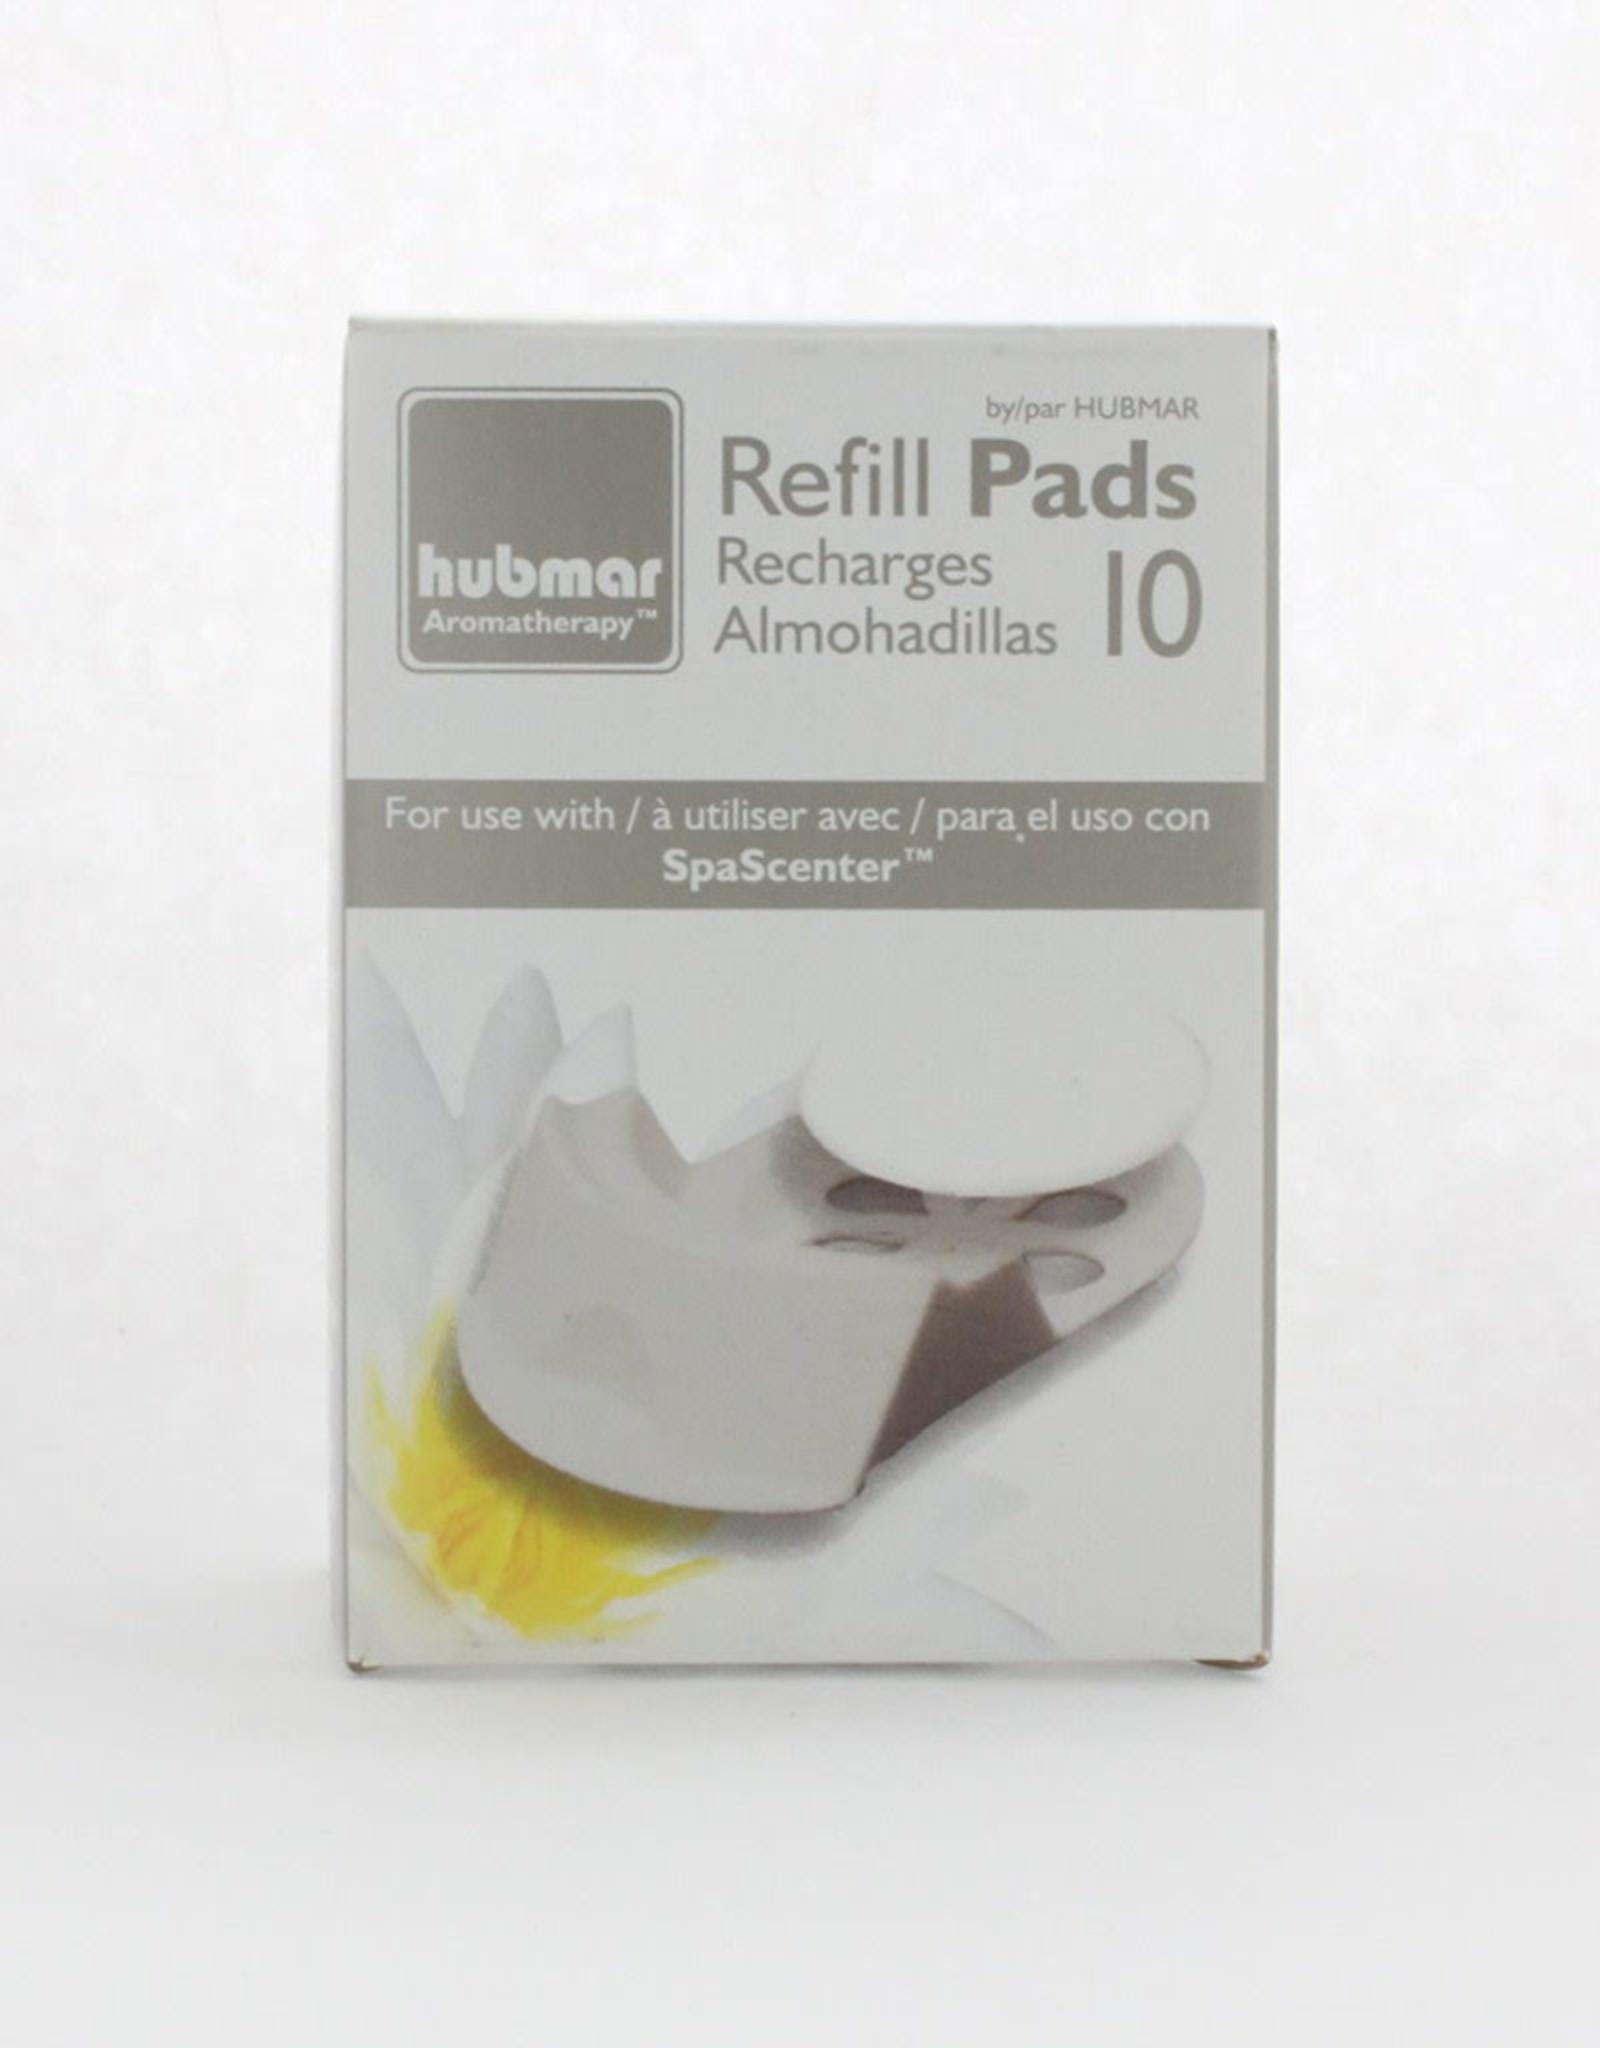 Hubmar Aromatherapy 10 Refill Pads